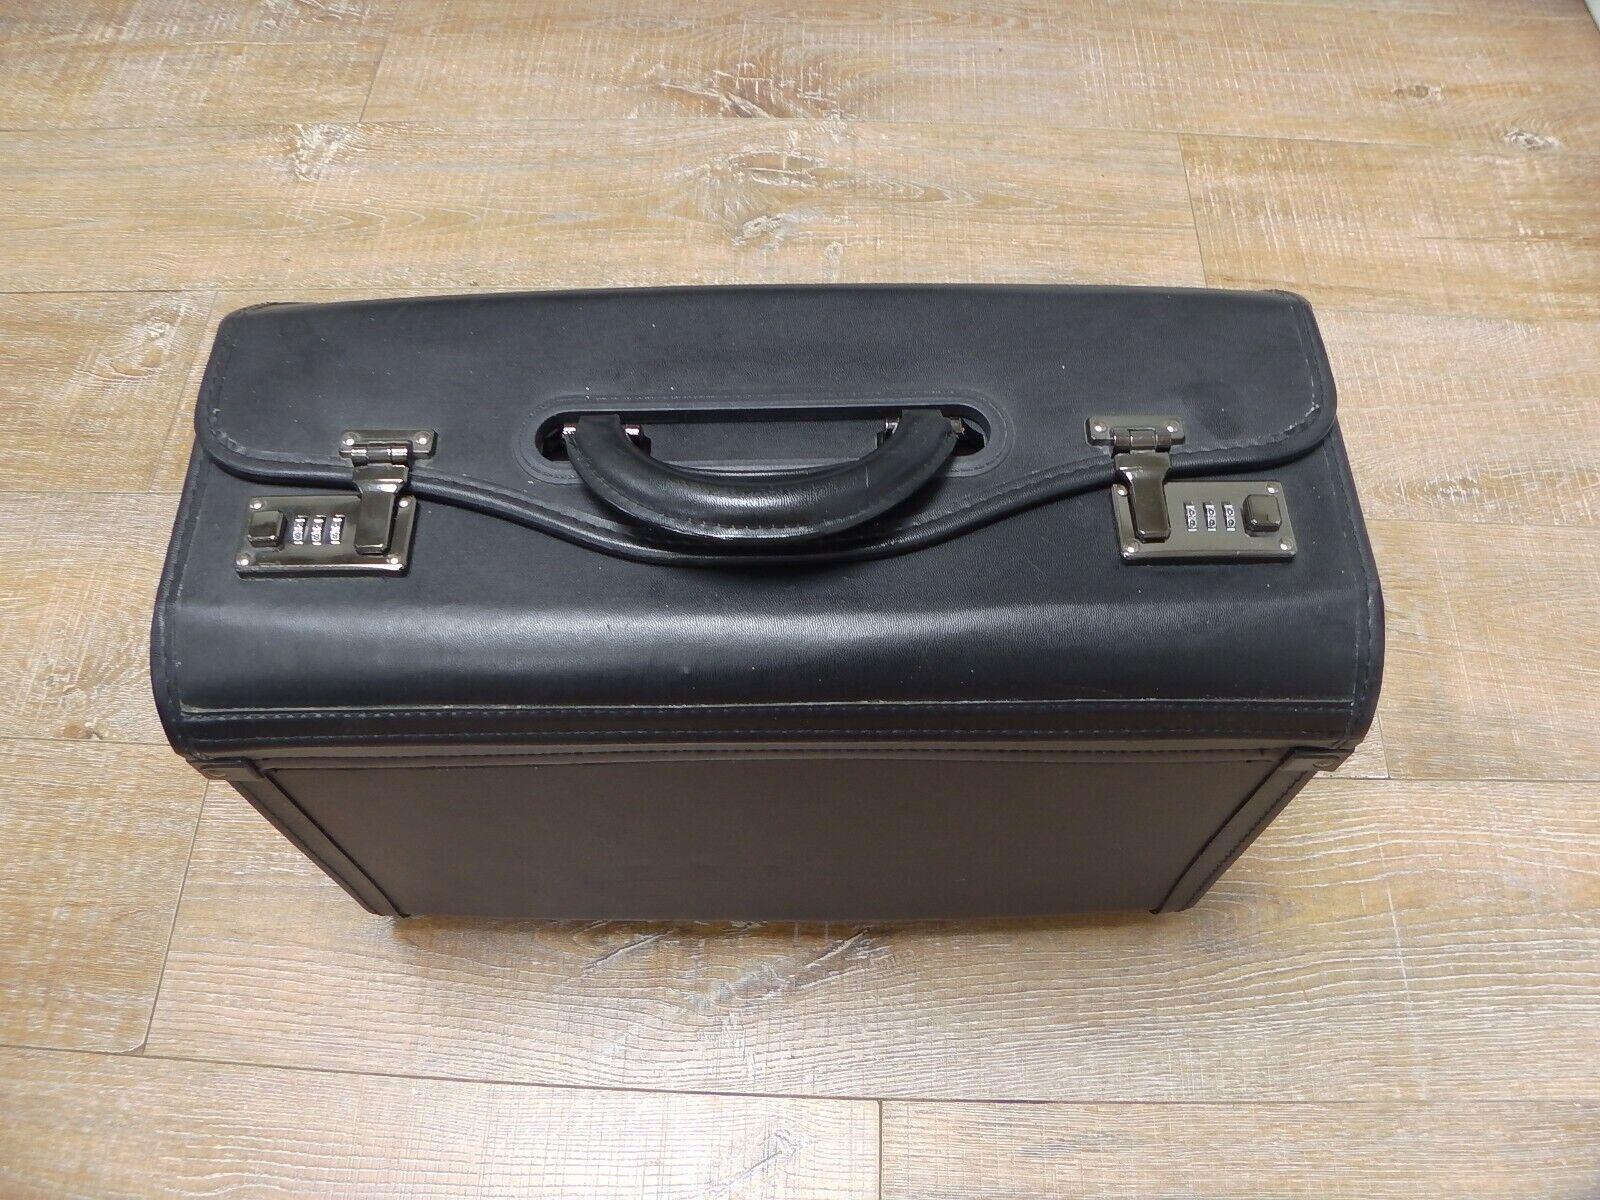 Large Leather Foto Hard Case Bag Camera Photography Travel Protective Suitcase